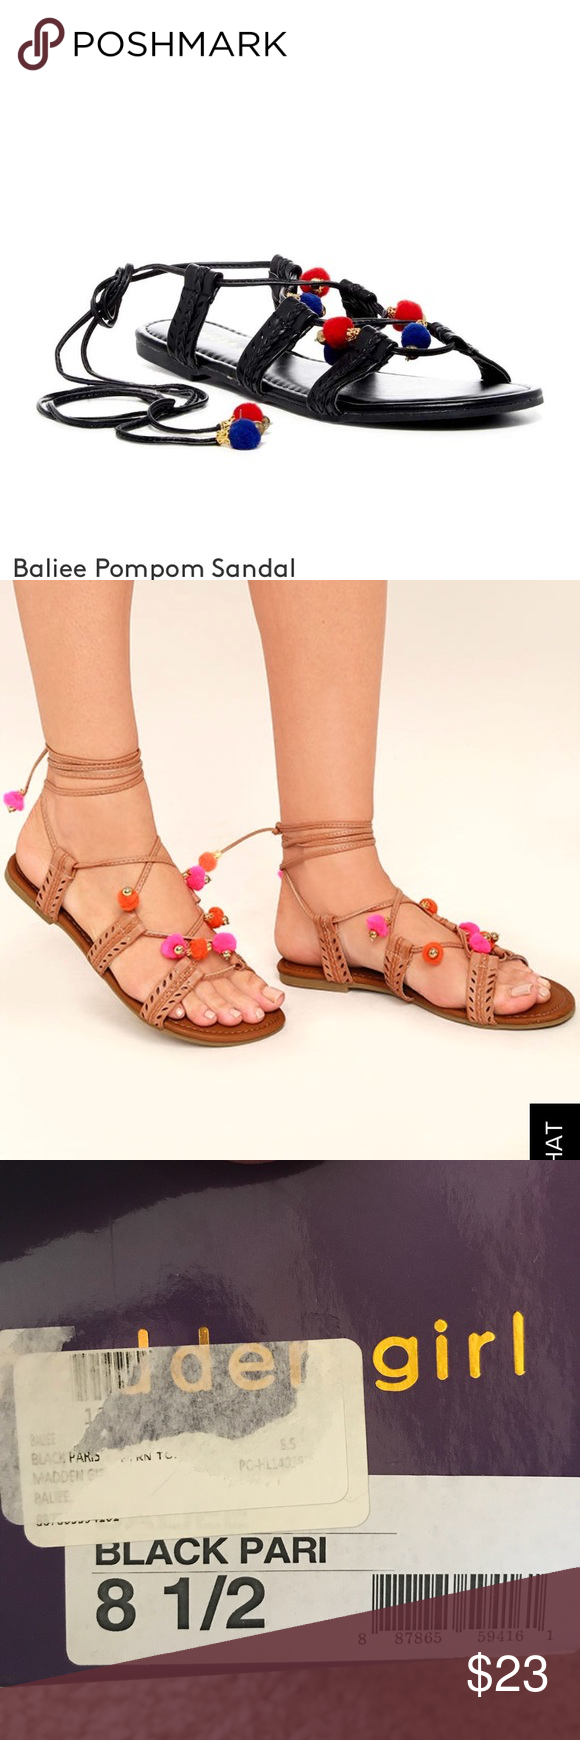 0583396d3880 🆕Madden Girl Pom Pom lace up sandals 8.5 Adorable black Pom Pom lace up  sandals